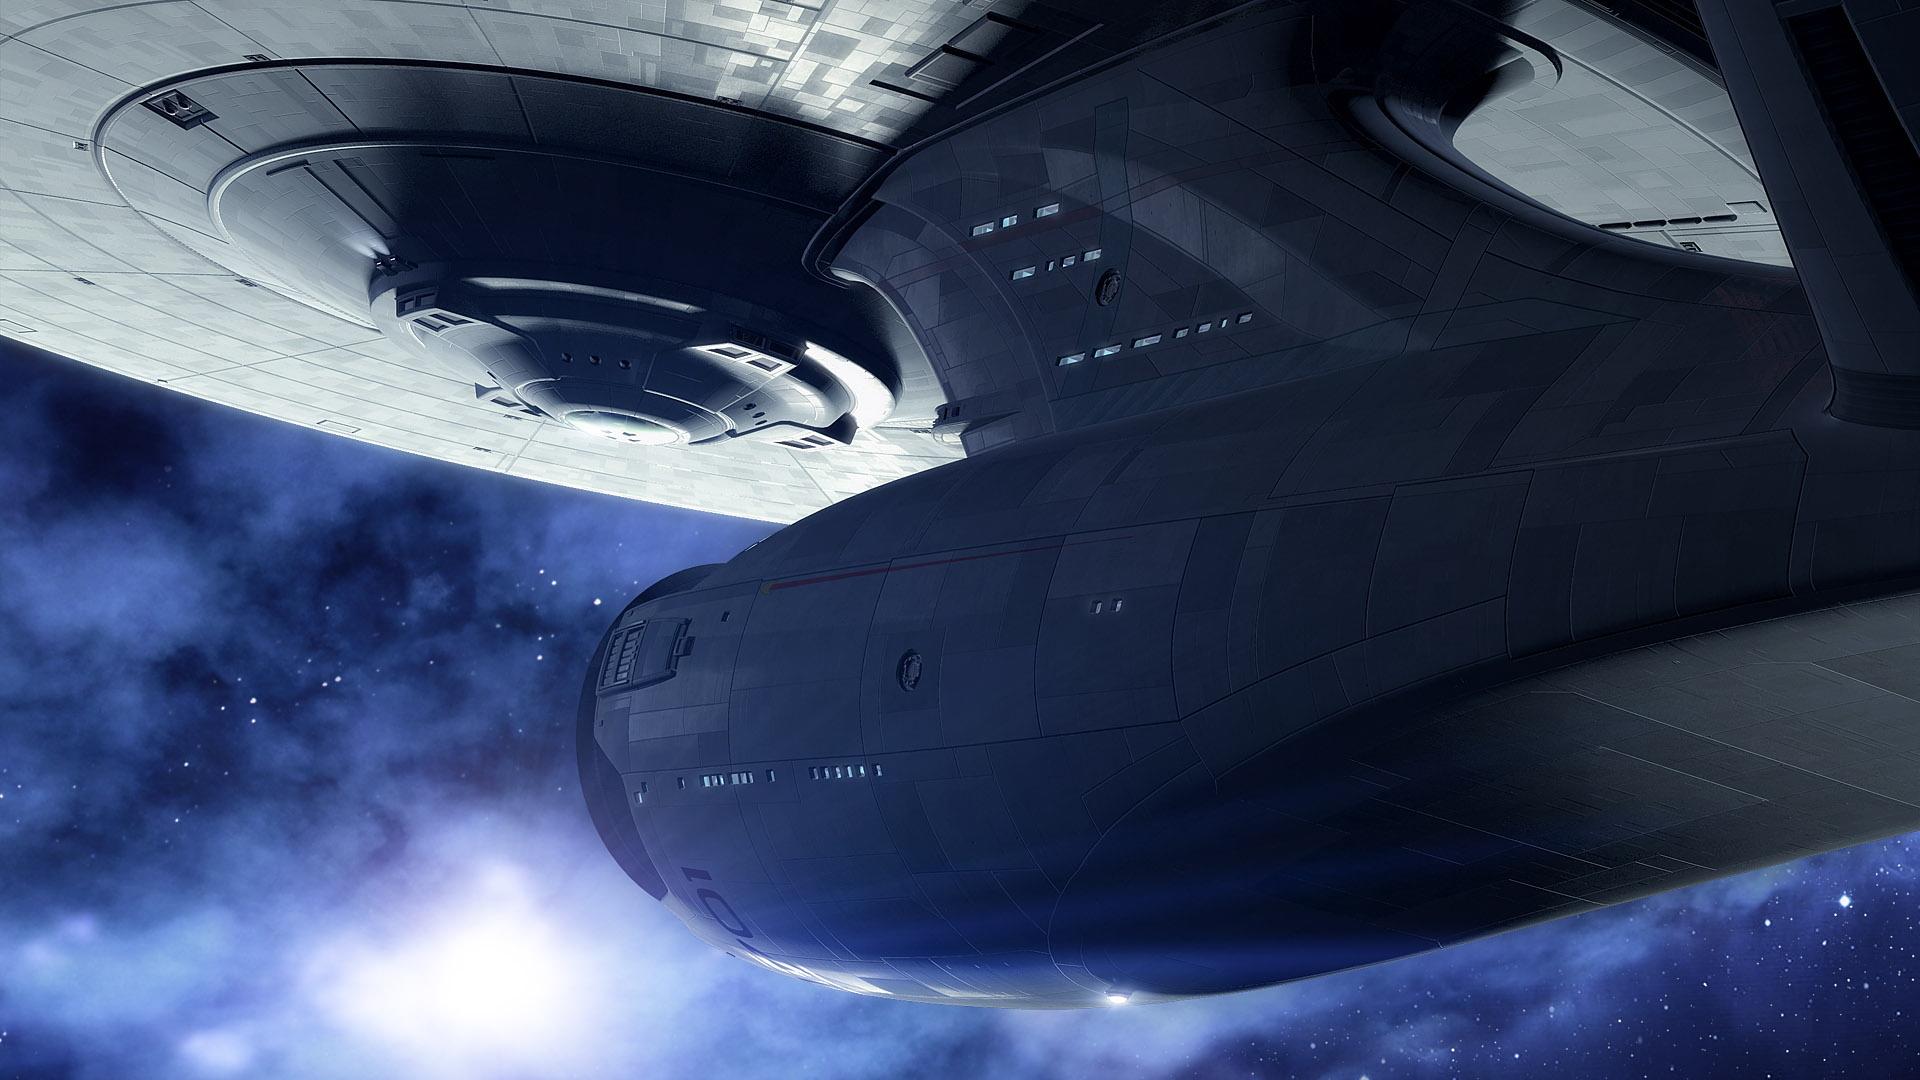 USS Enterprise   Star Trek wallpaper 5827 1920x1080